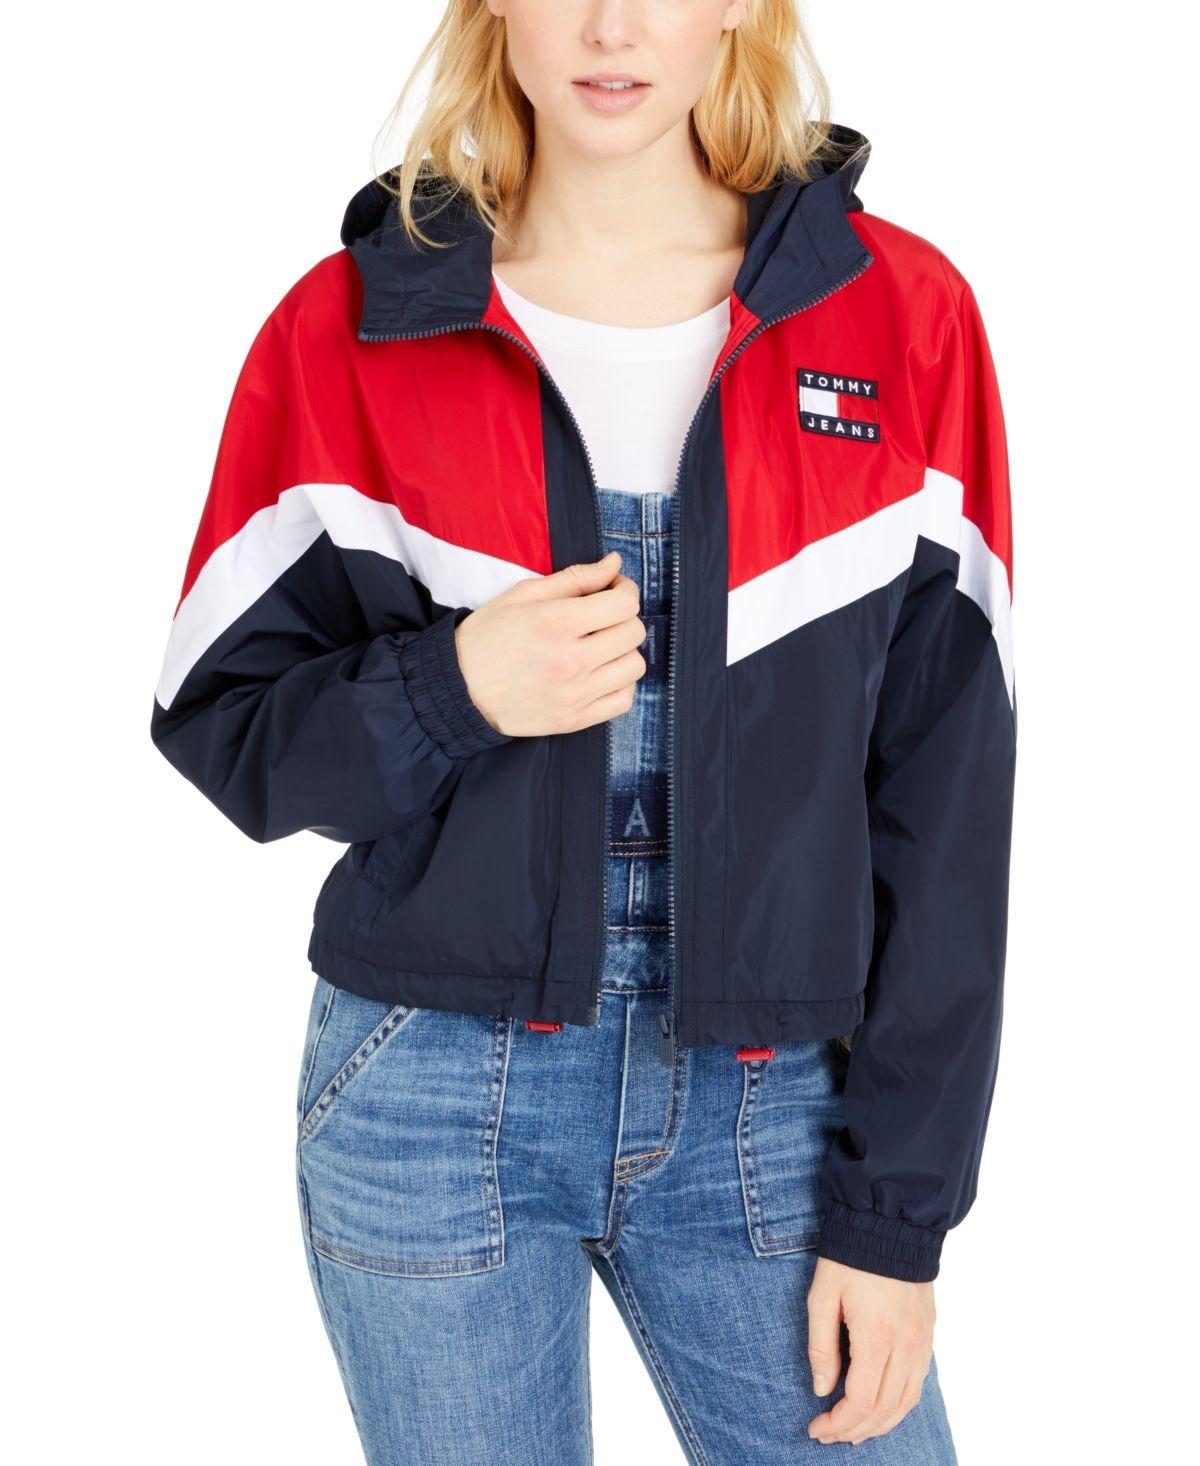 Pin By Carli Salomon On Dis Drip Windbreaker Jacket Women Blazer Jackets For Women Windbreaker Jacket [ 1466 x 1200 Pixel ]